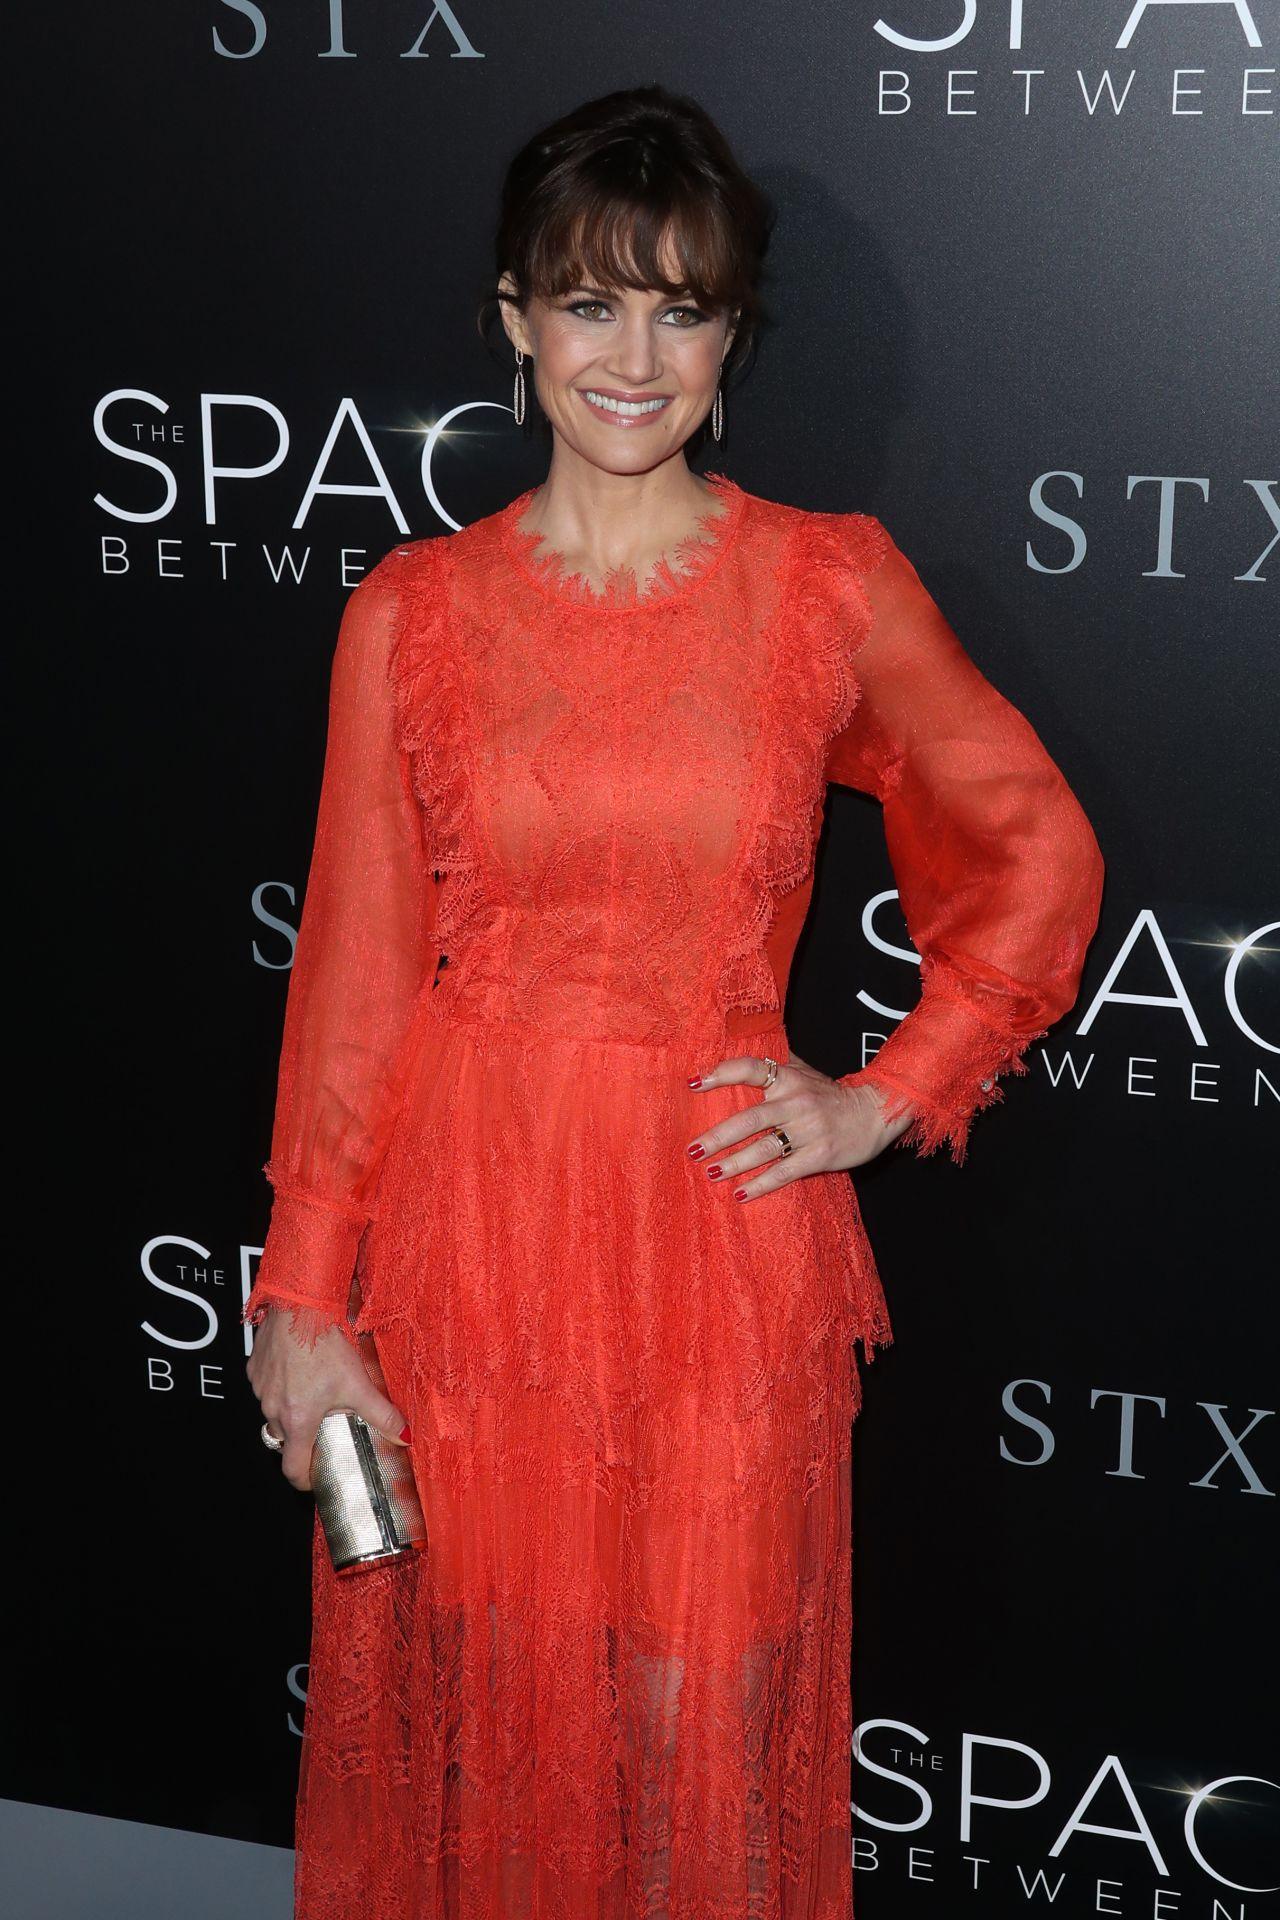 Carla Gugino The Space Between Us Premiere In Los